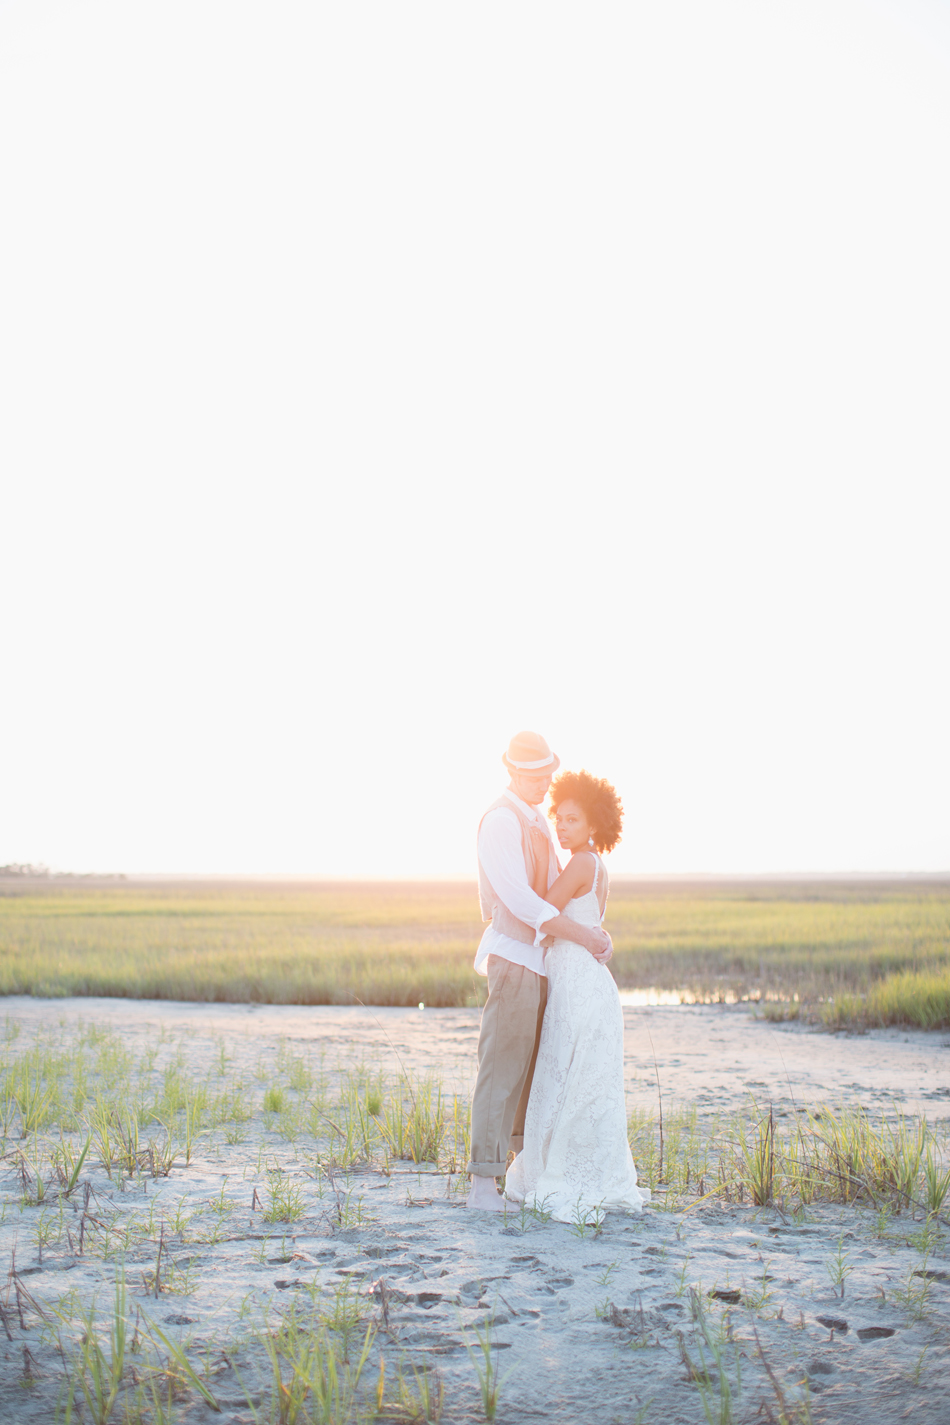 Jameykay_arlie_bohemian_elopement_styled_shoot075.jpg